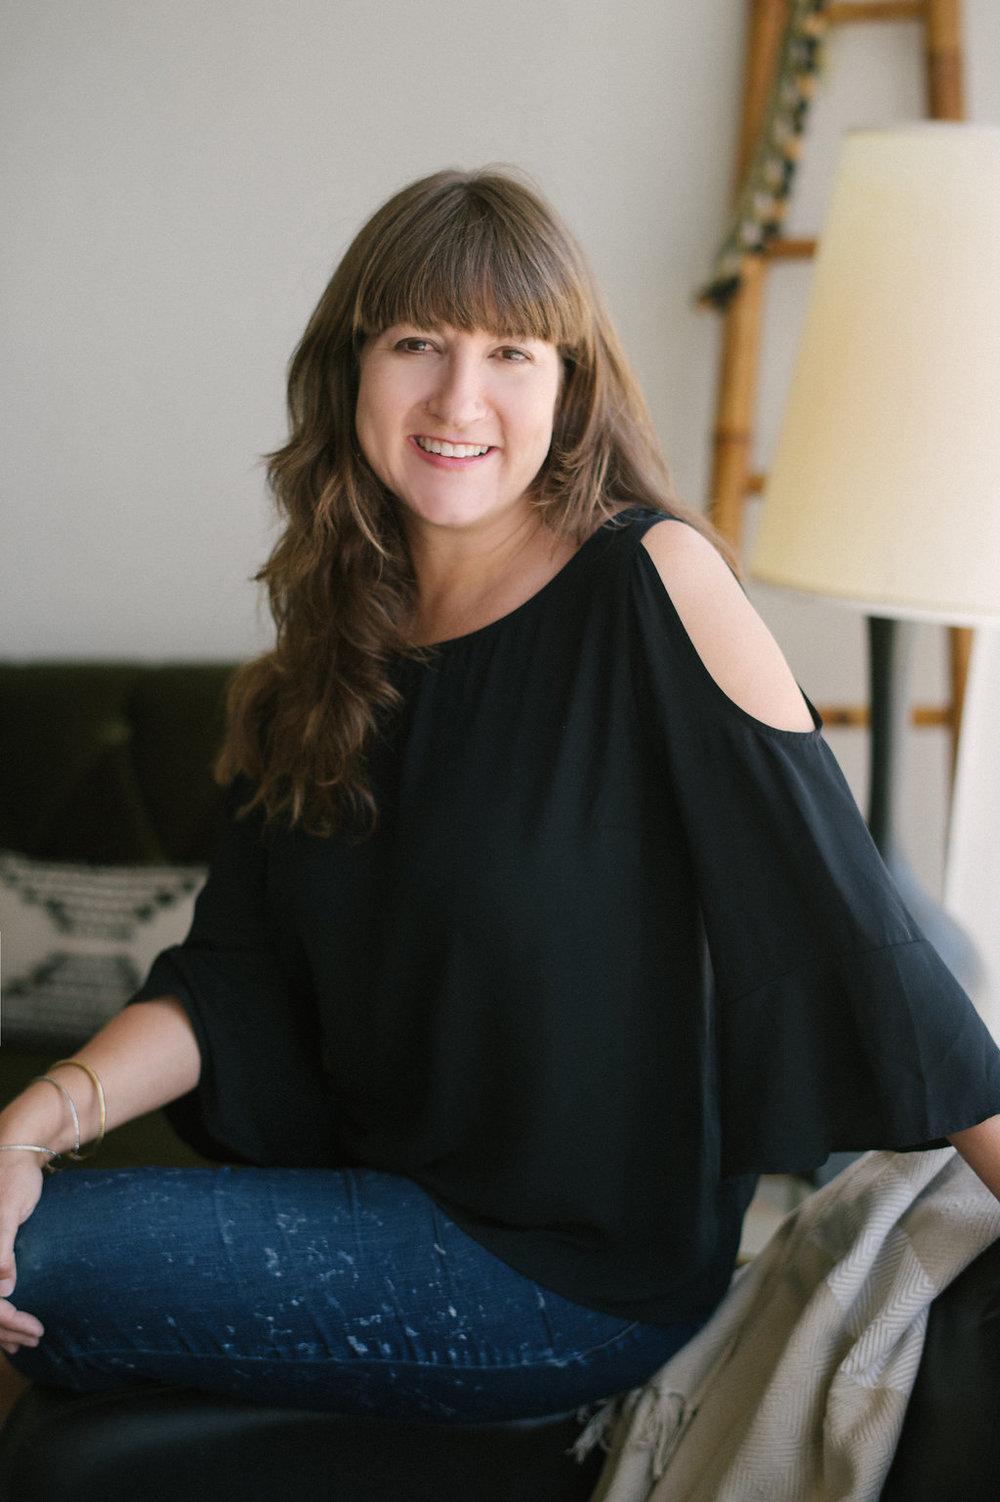 Lisa Malott